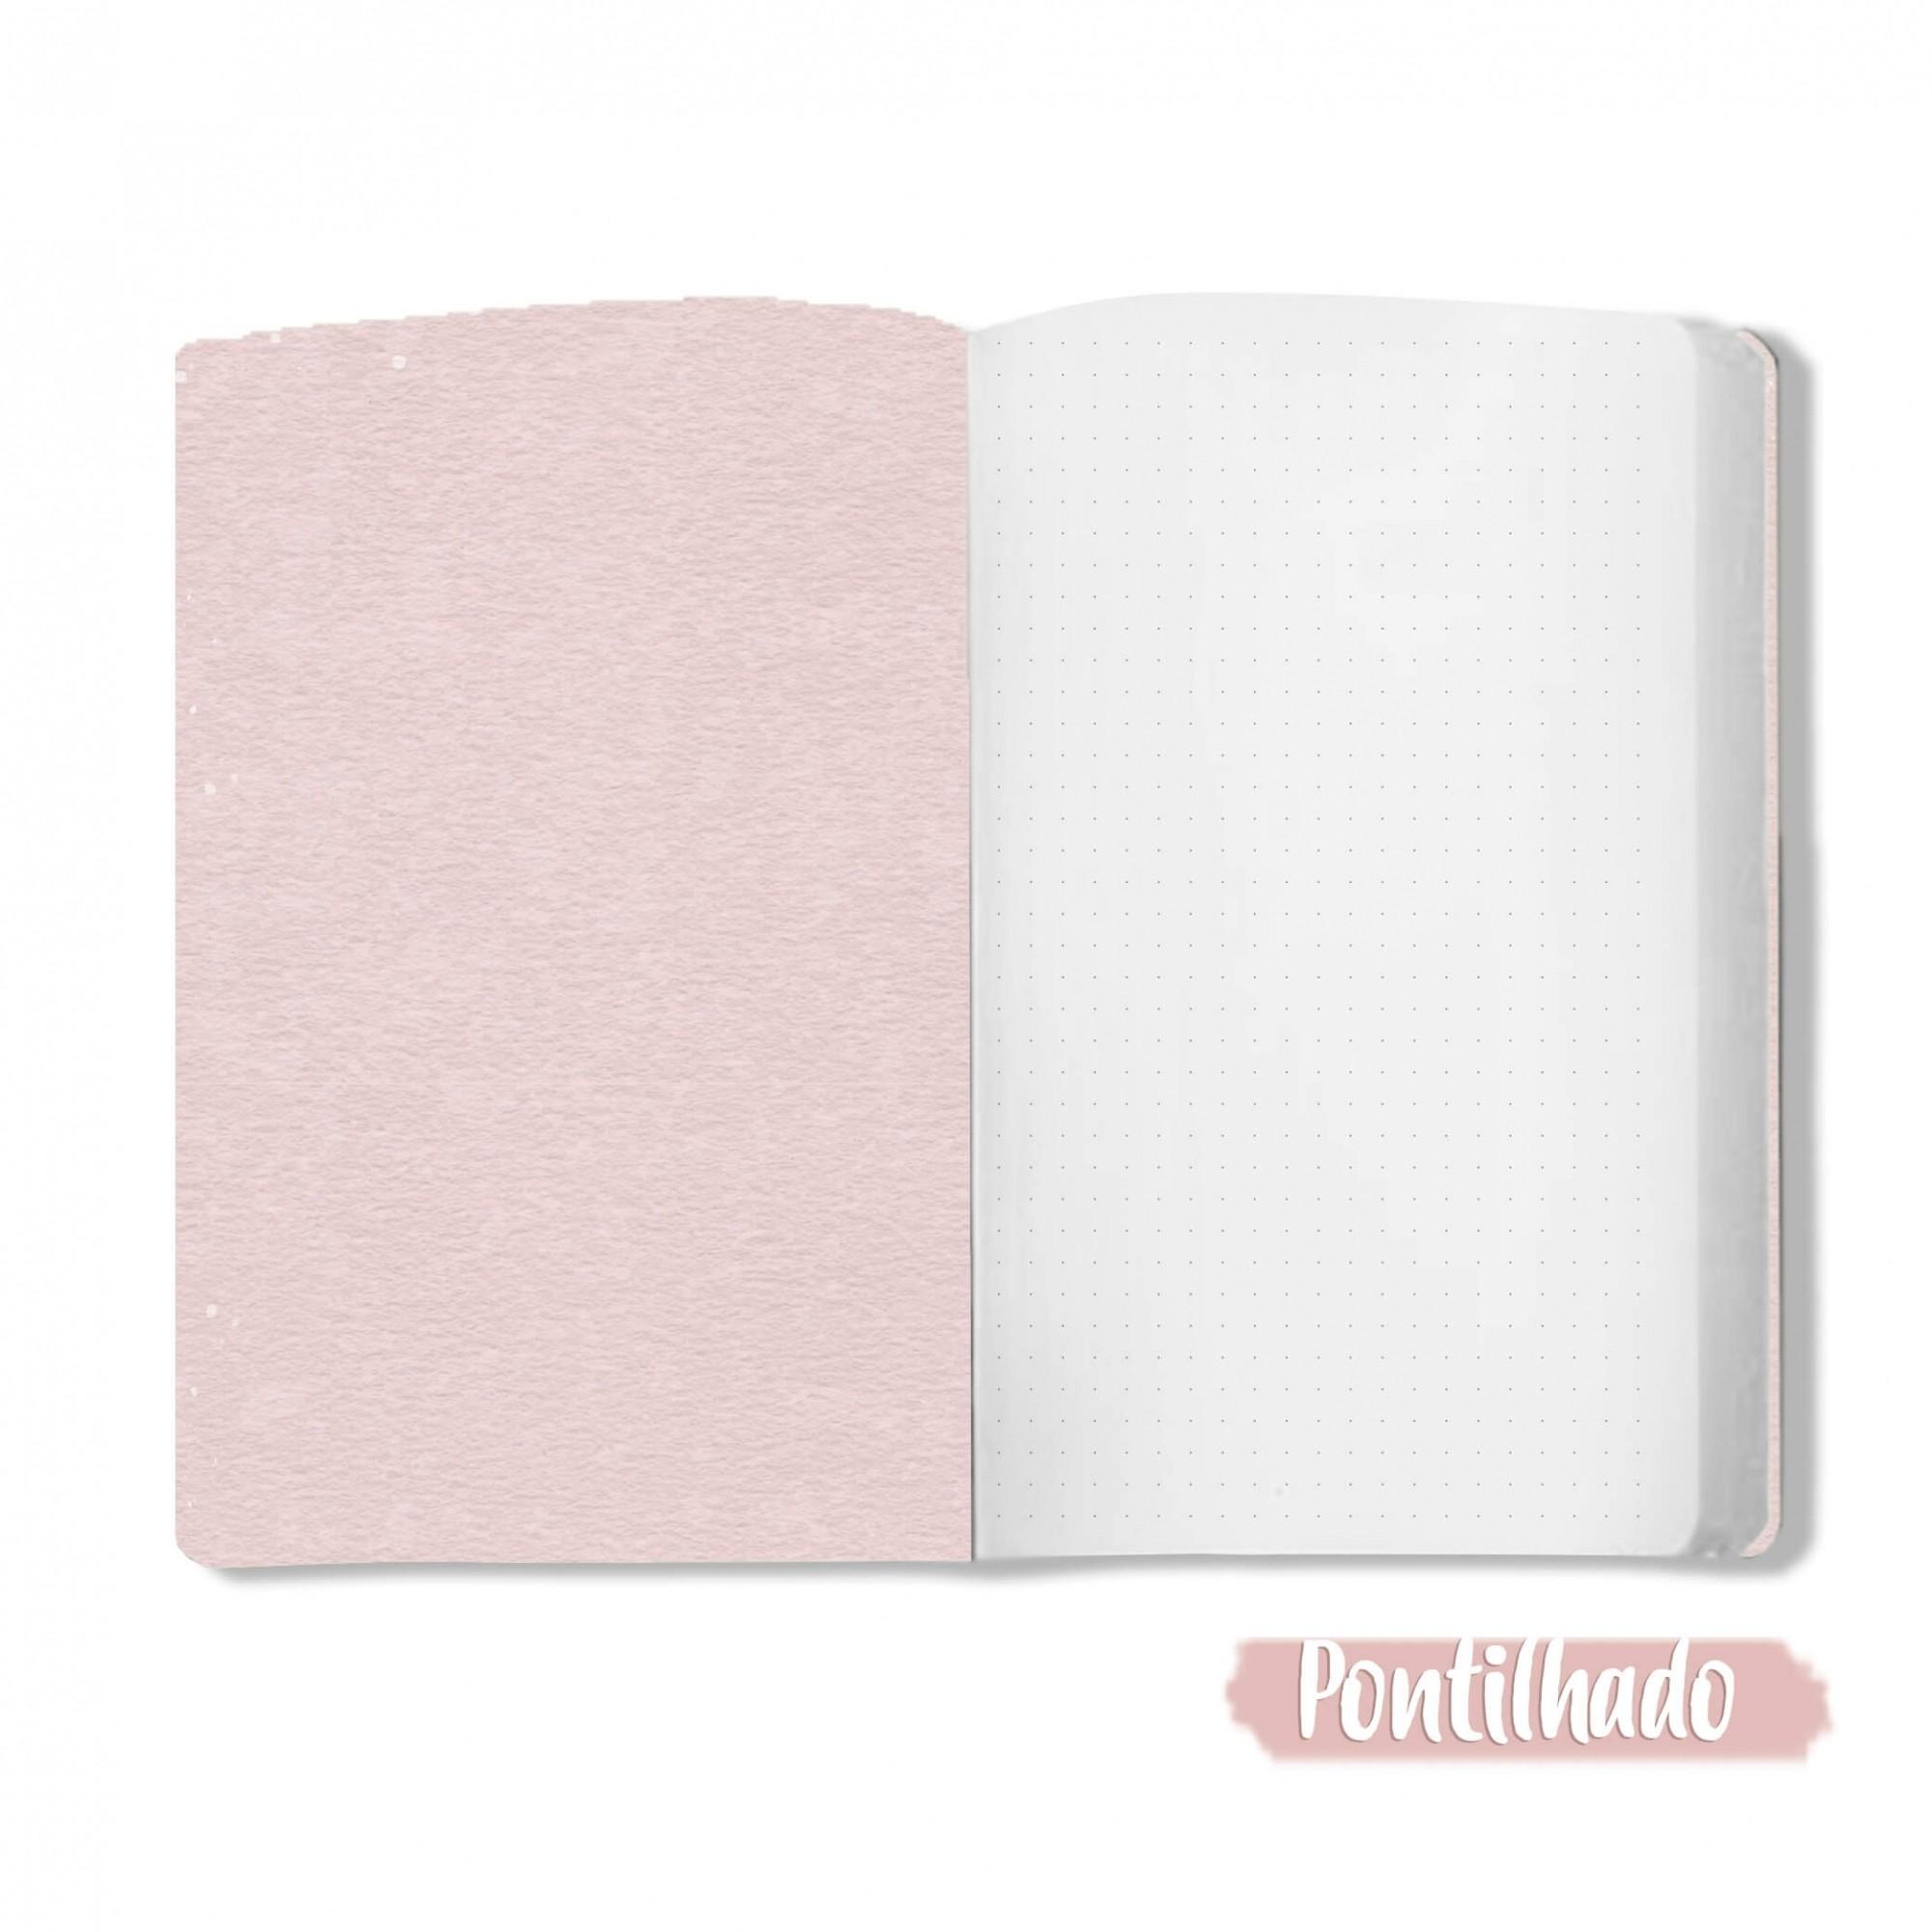 Caderno Bola de Chiclete - Scrap Minuto - Coleção Toda Básica / JuJu Scrapbook  - JuJu Scrapbook